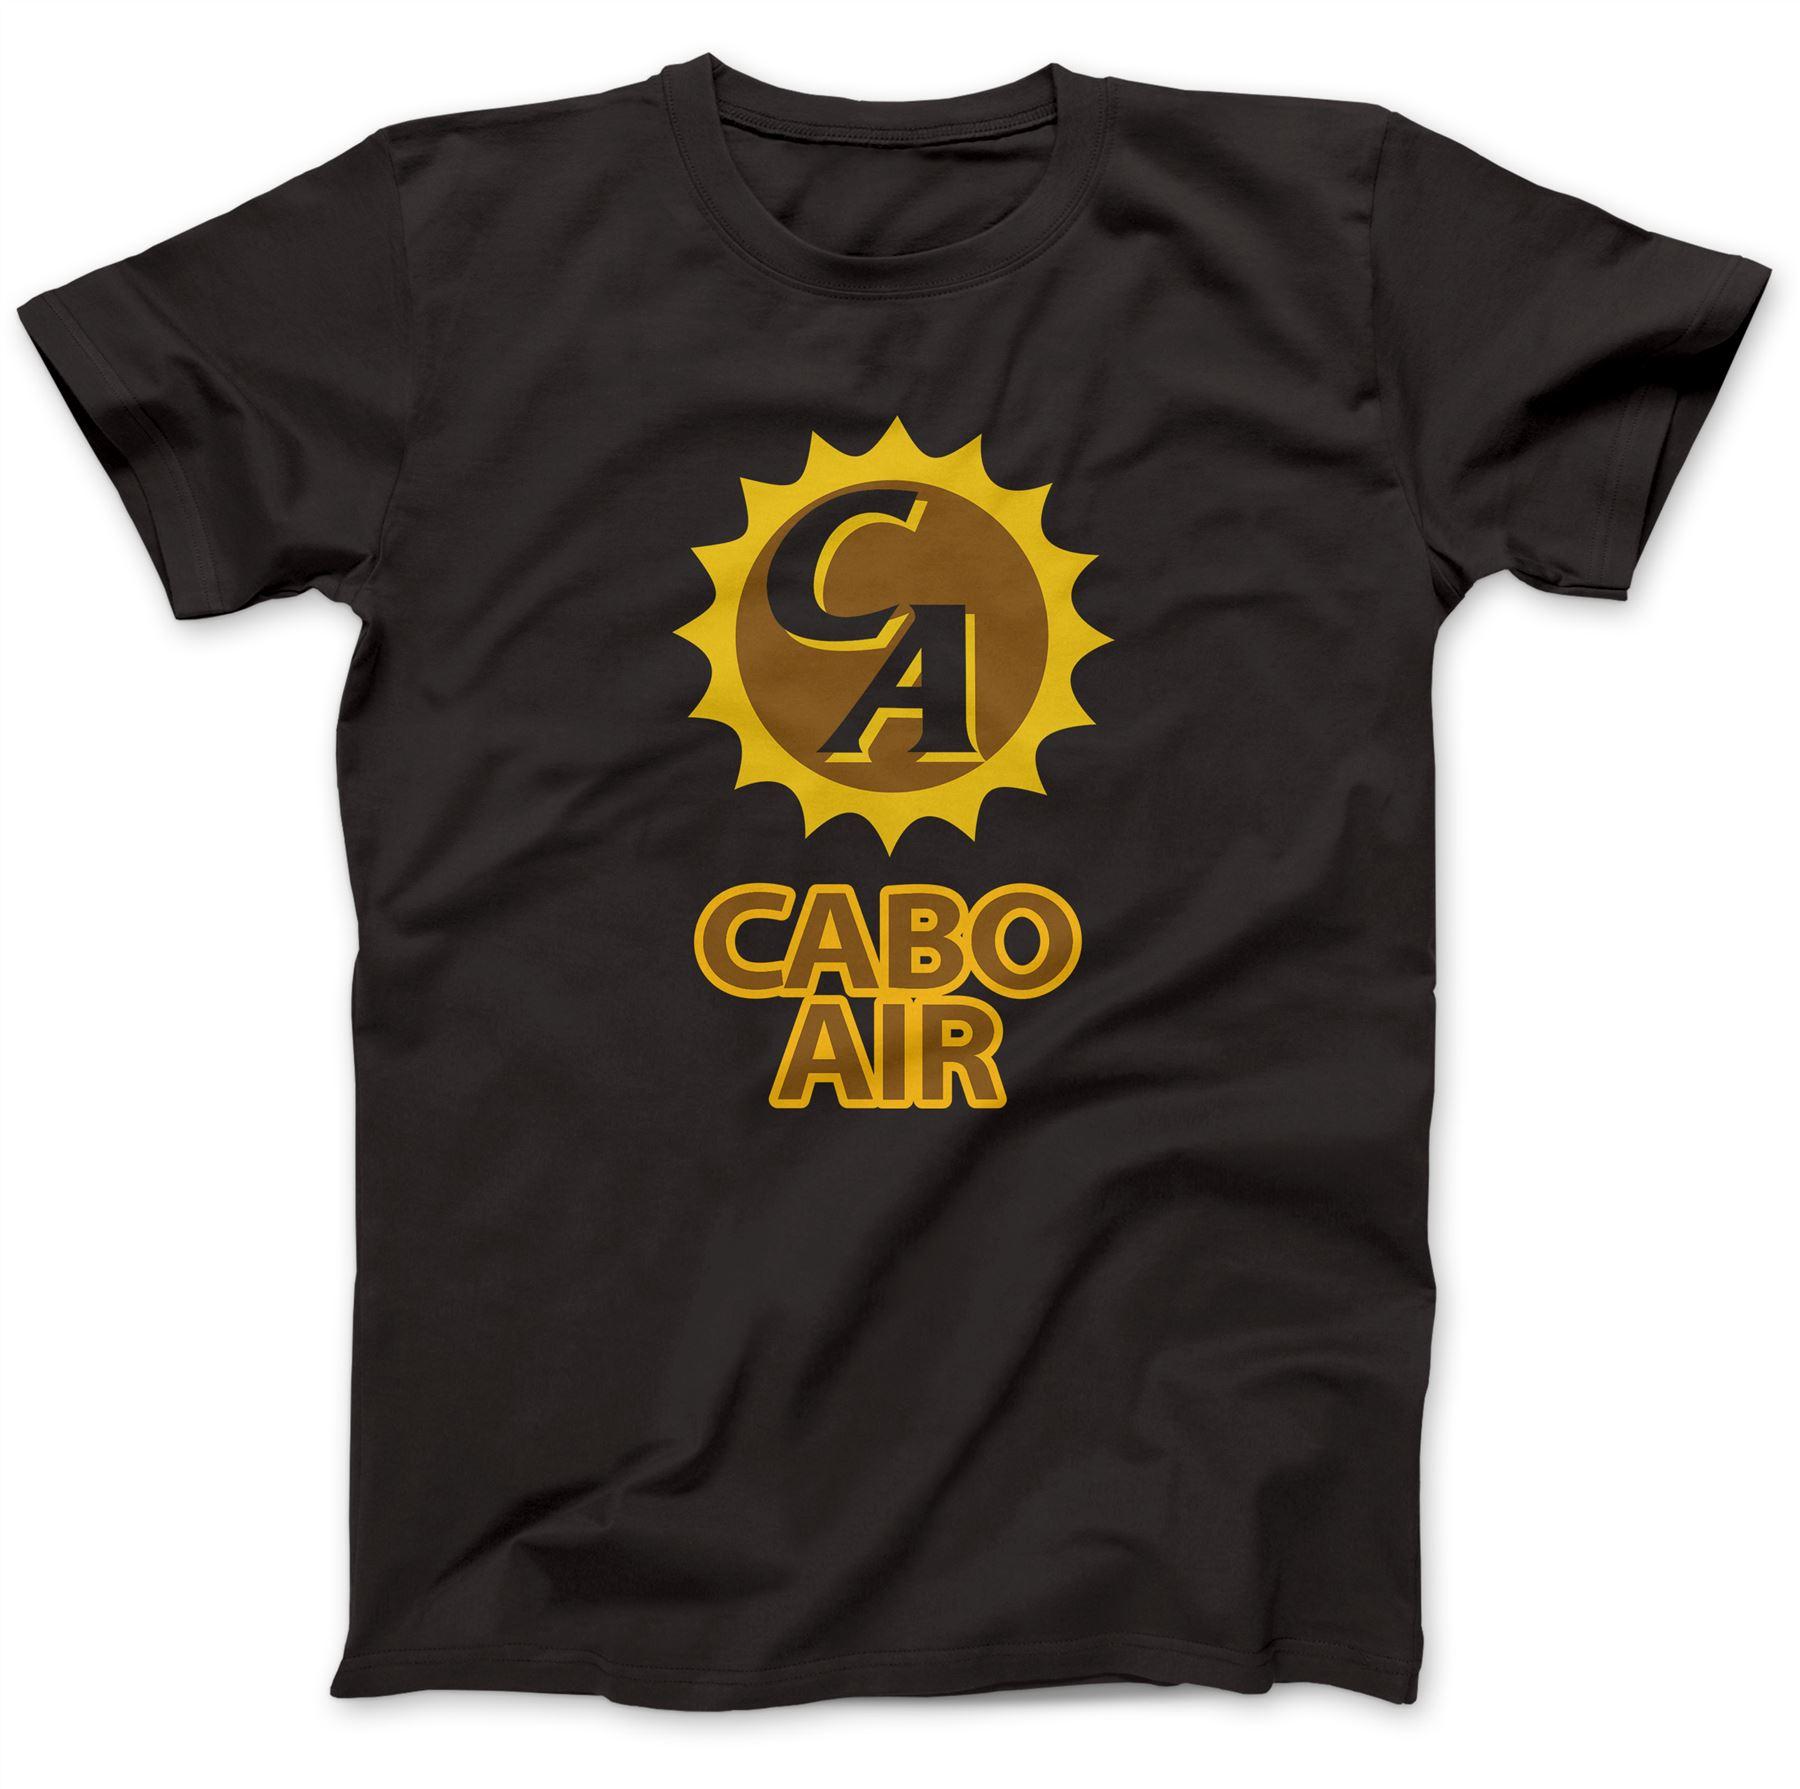 cabo-air-inspired-by-jackie-brown-t-shirt-100-premium-cotton-quentin-font-b-tarantino-b-font-short-sleeves-cotton-t-shirt-fashion